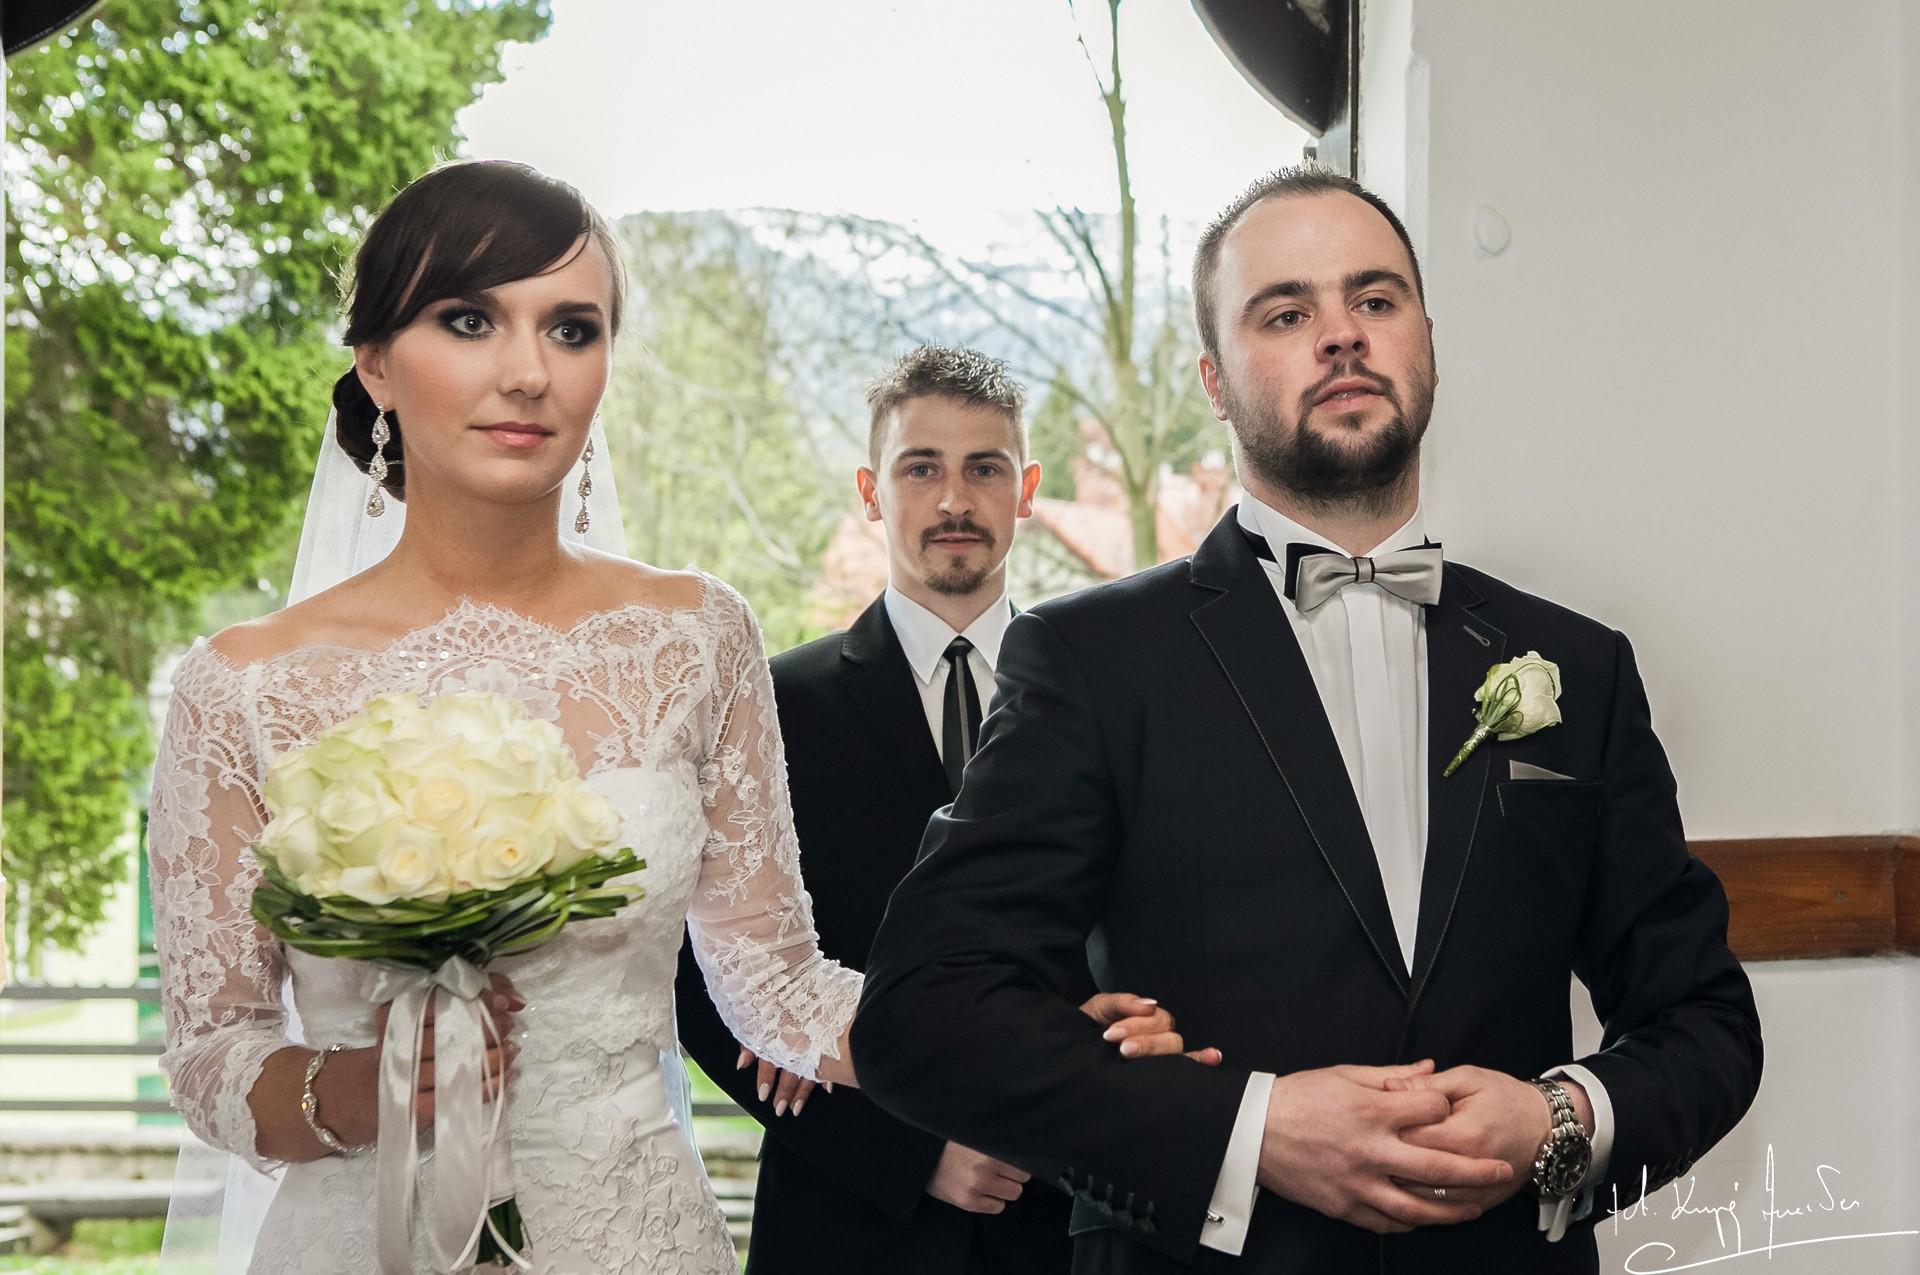 fotograf slubny szklarska poreba 28 Alicja & Tomasz